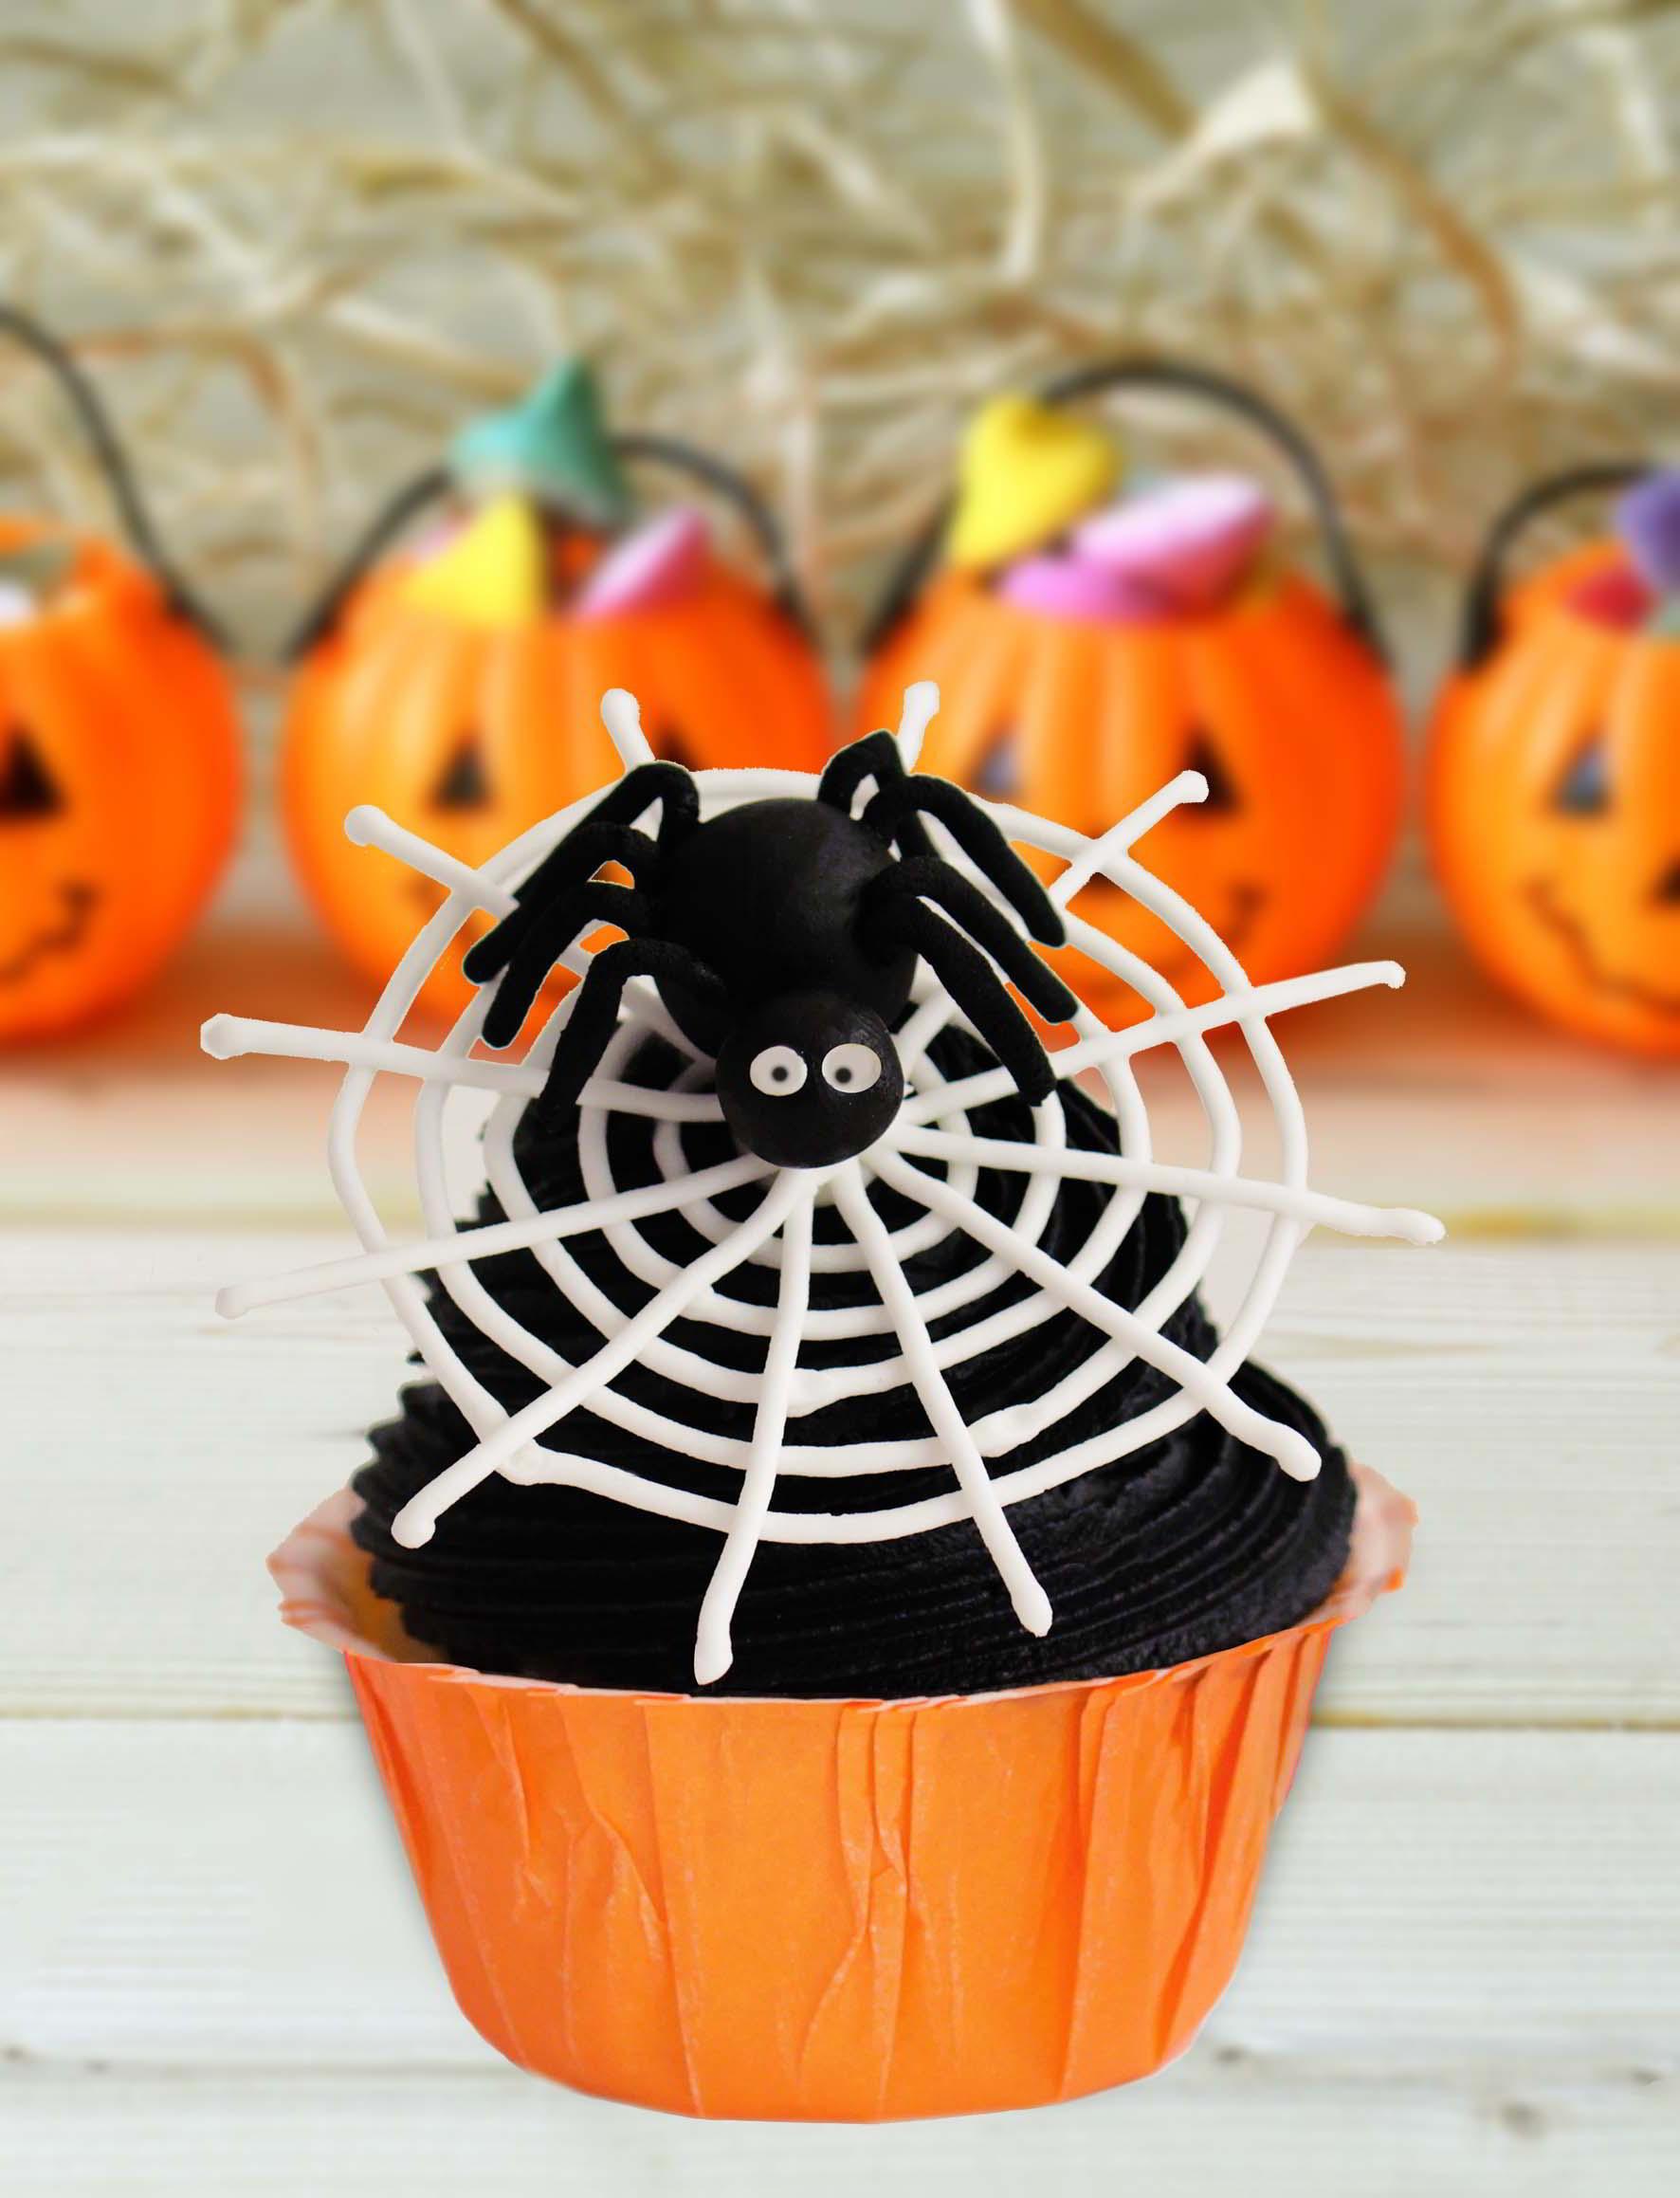 Cupcakes Para Halloween  Cupcakes halloween con telaraña ¡ y arañita My Karamelli